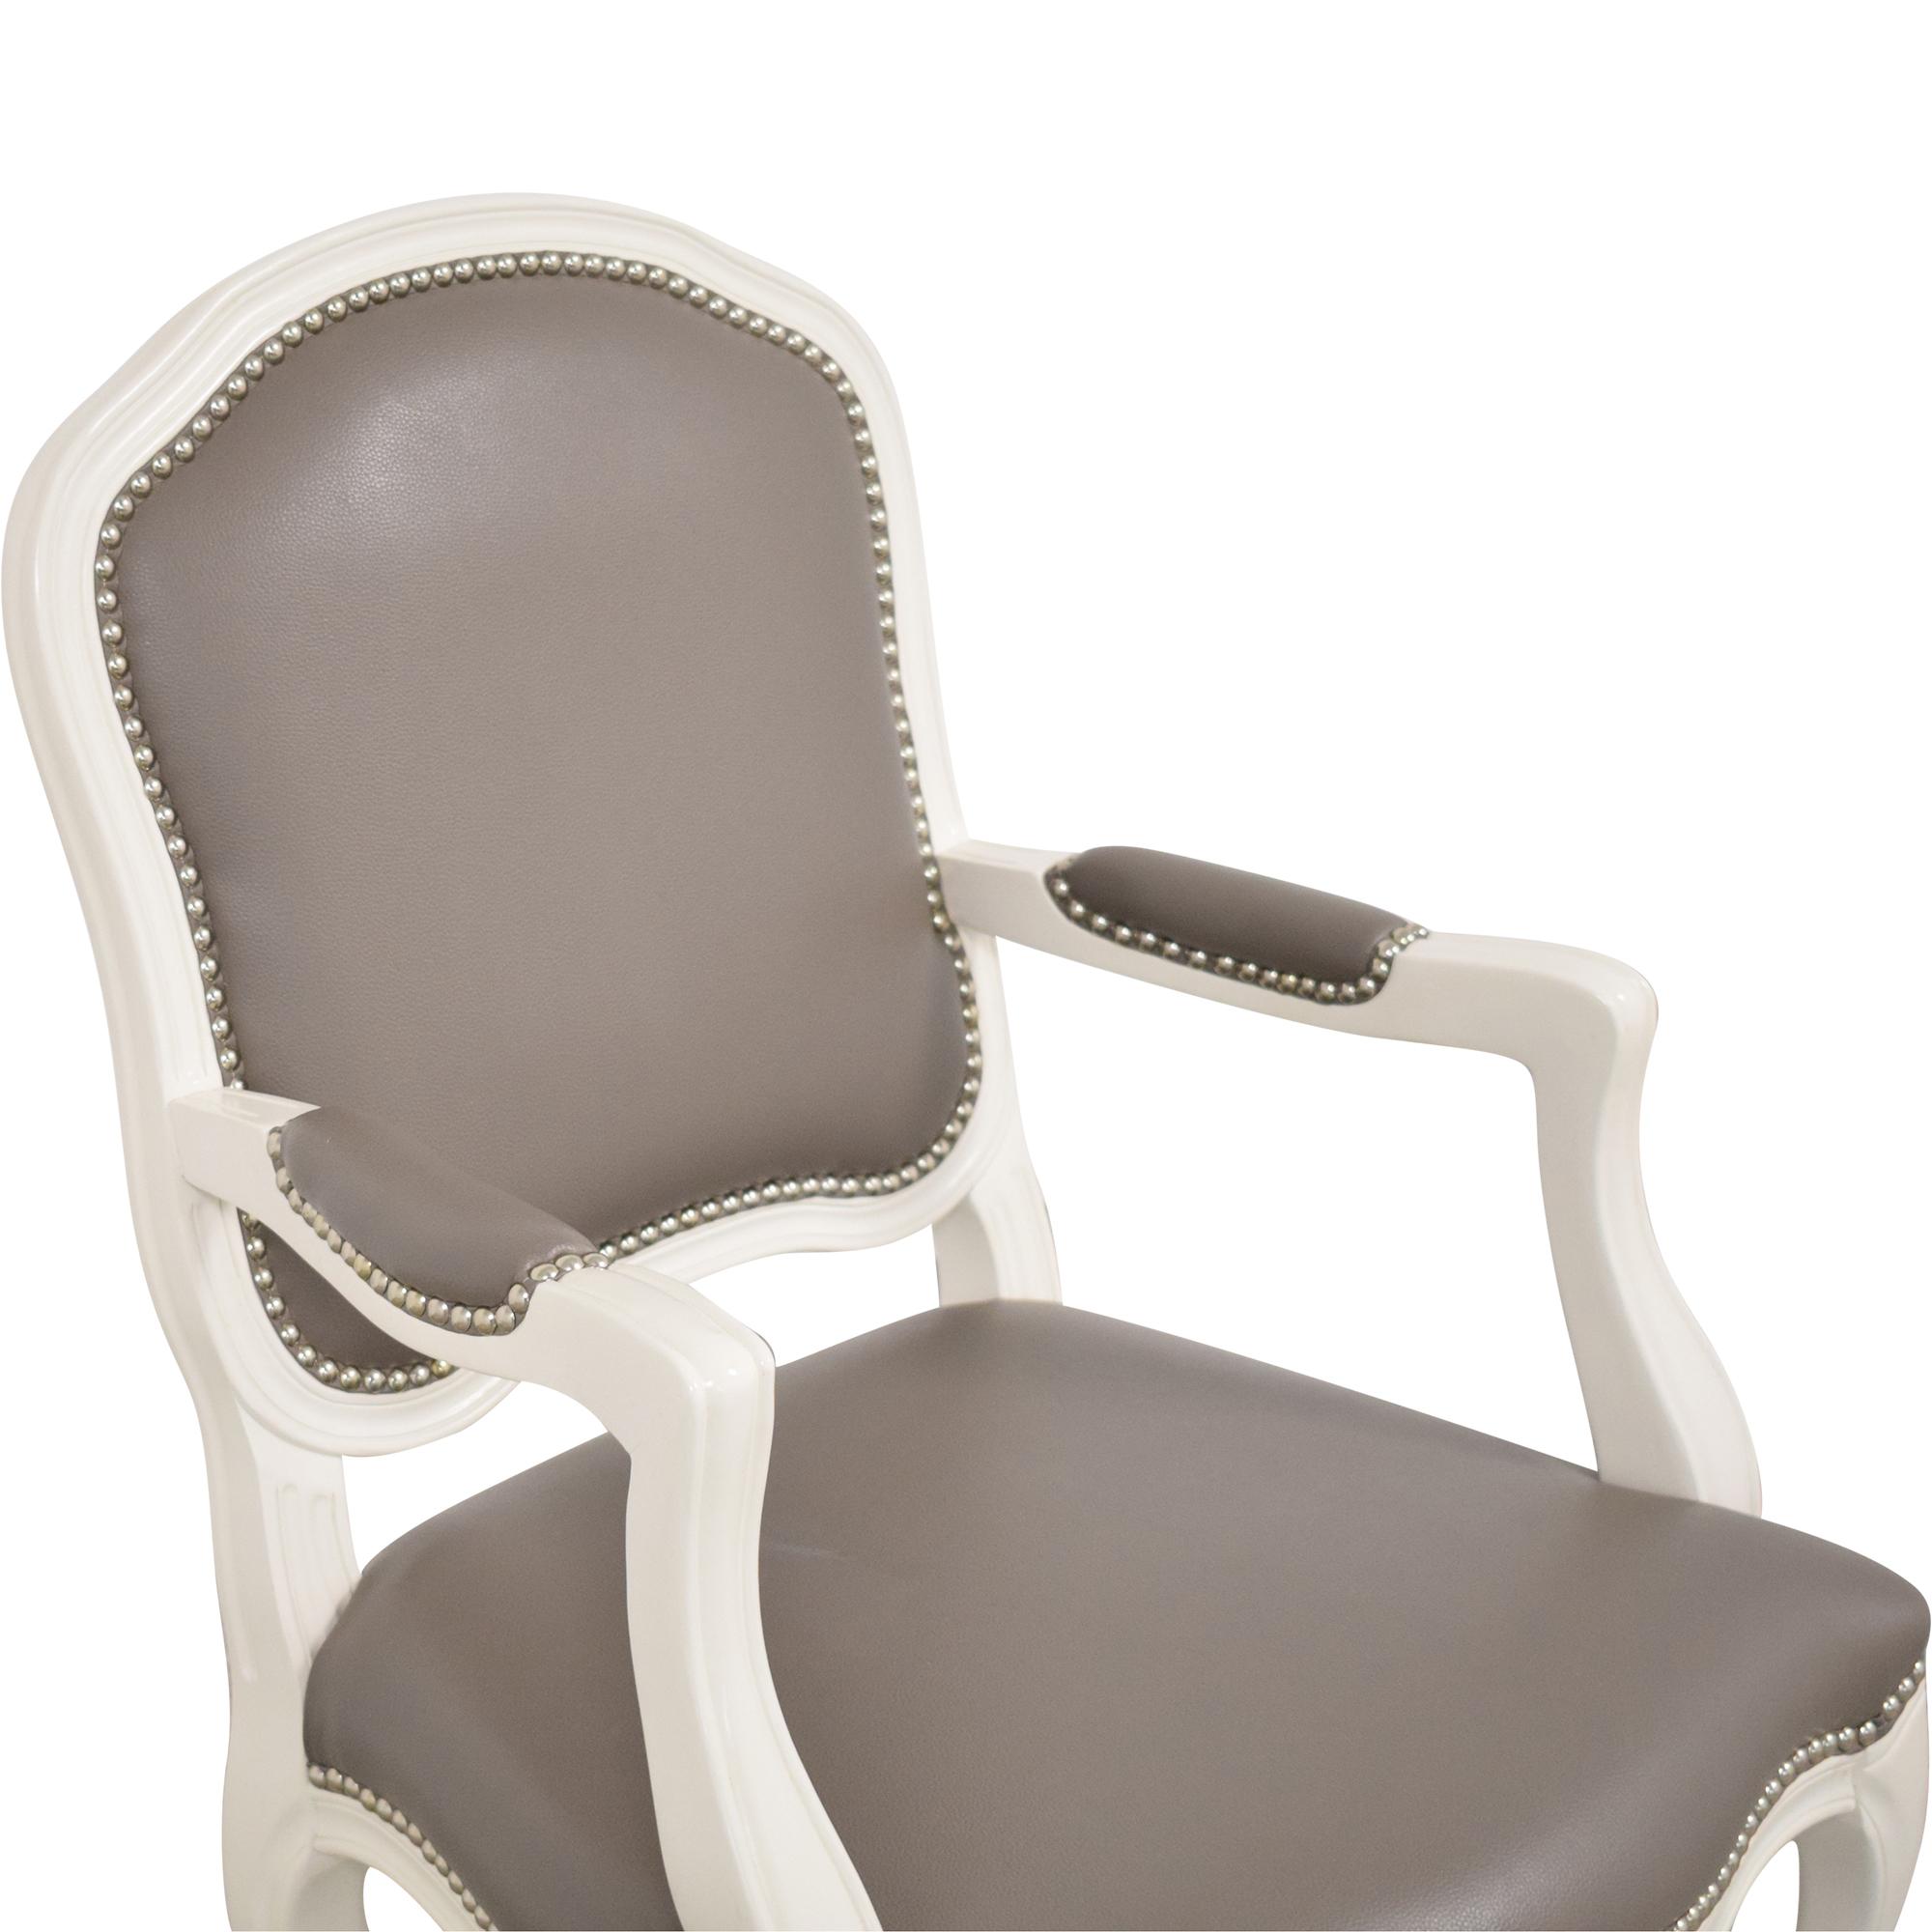 CB2 CB2 Stick Around Arm Chair by Novogratz for sale